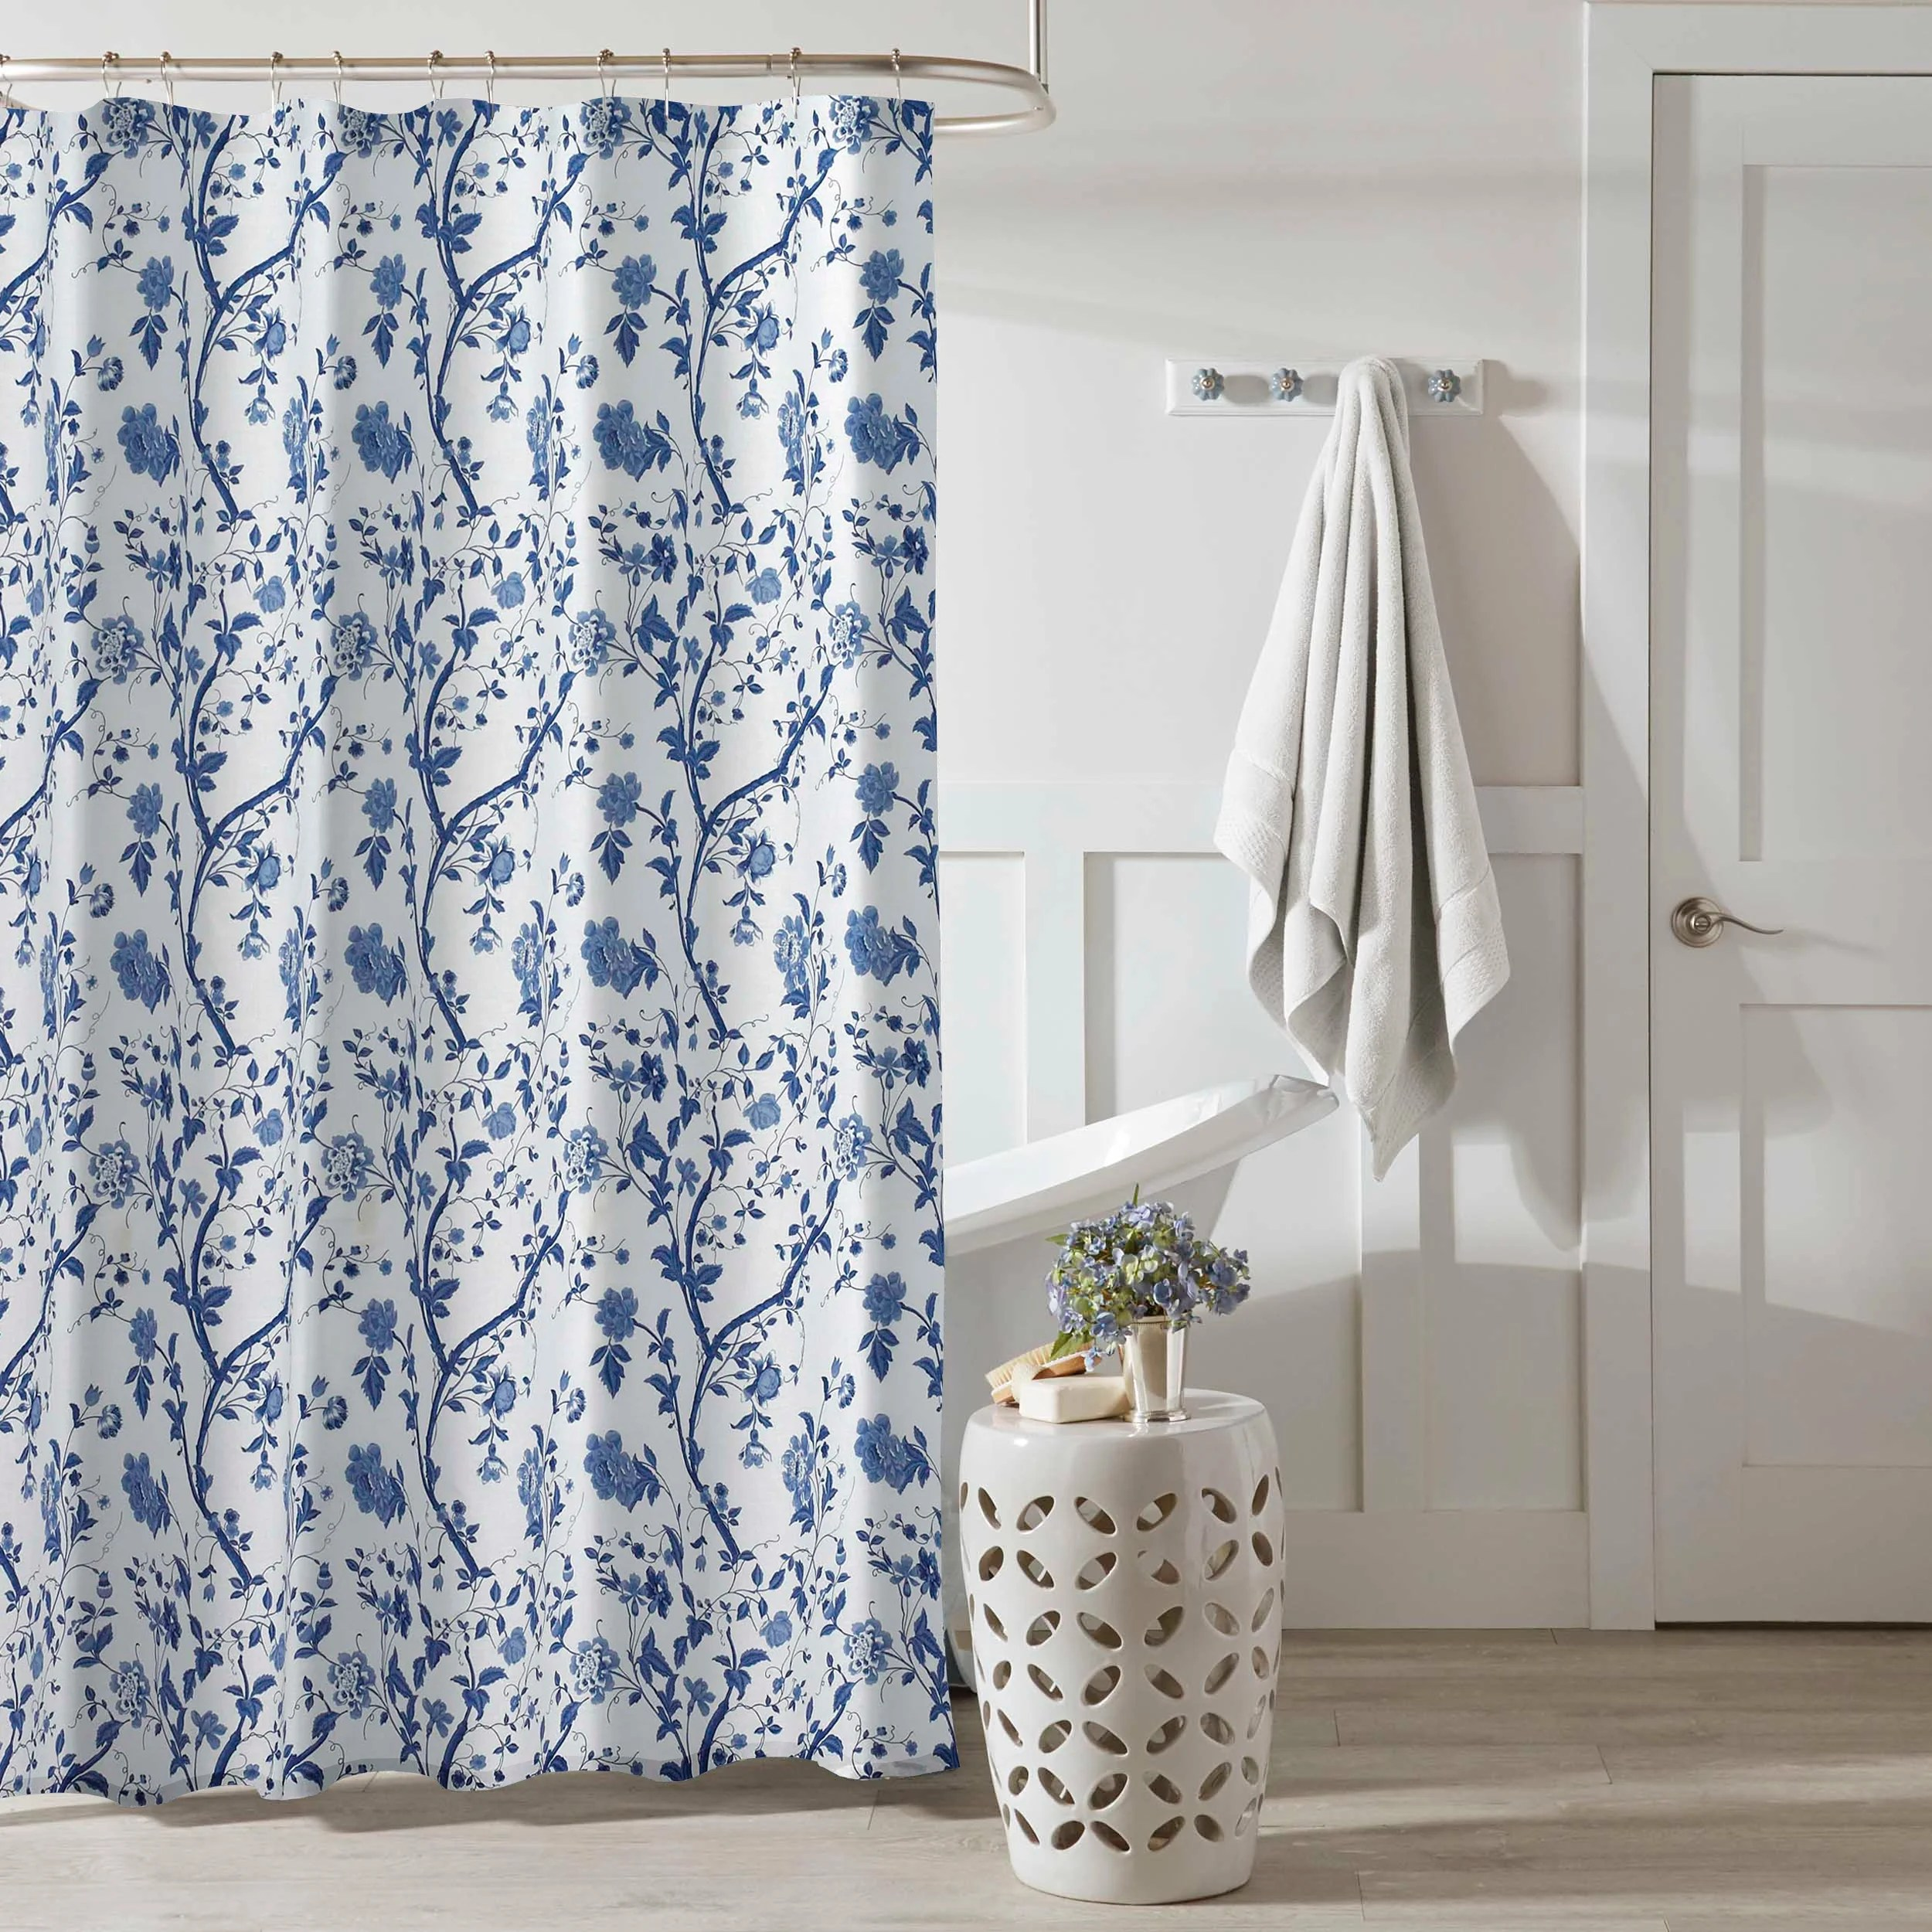 laura ashley charlotte blue floral shower curtain 72 x 72